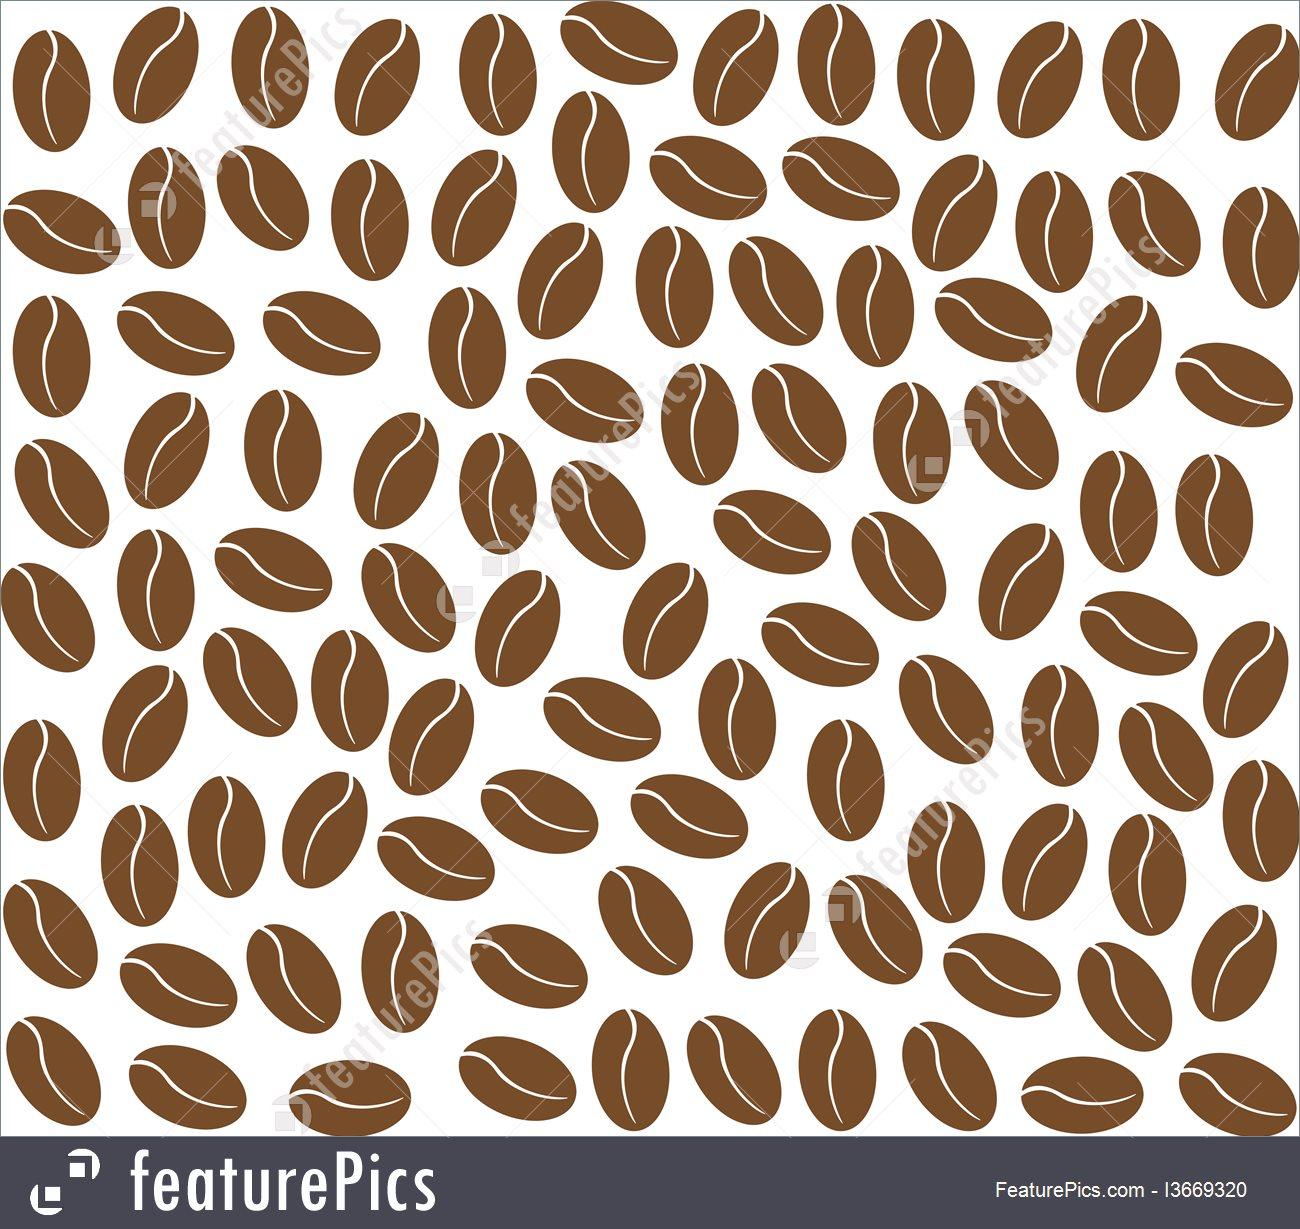 Beverage Ingredients Coffee Beans Background   Stock Illustration 1300x1229